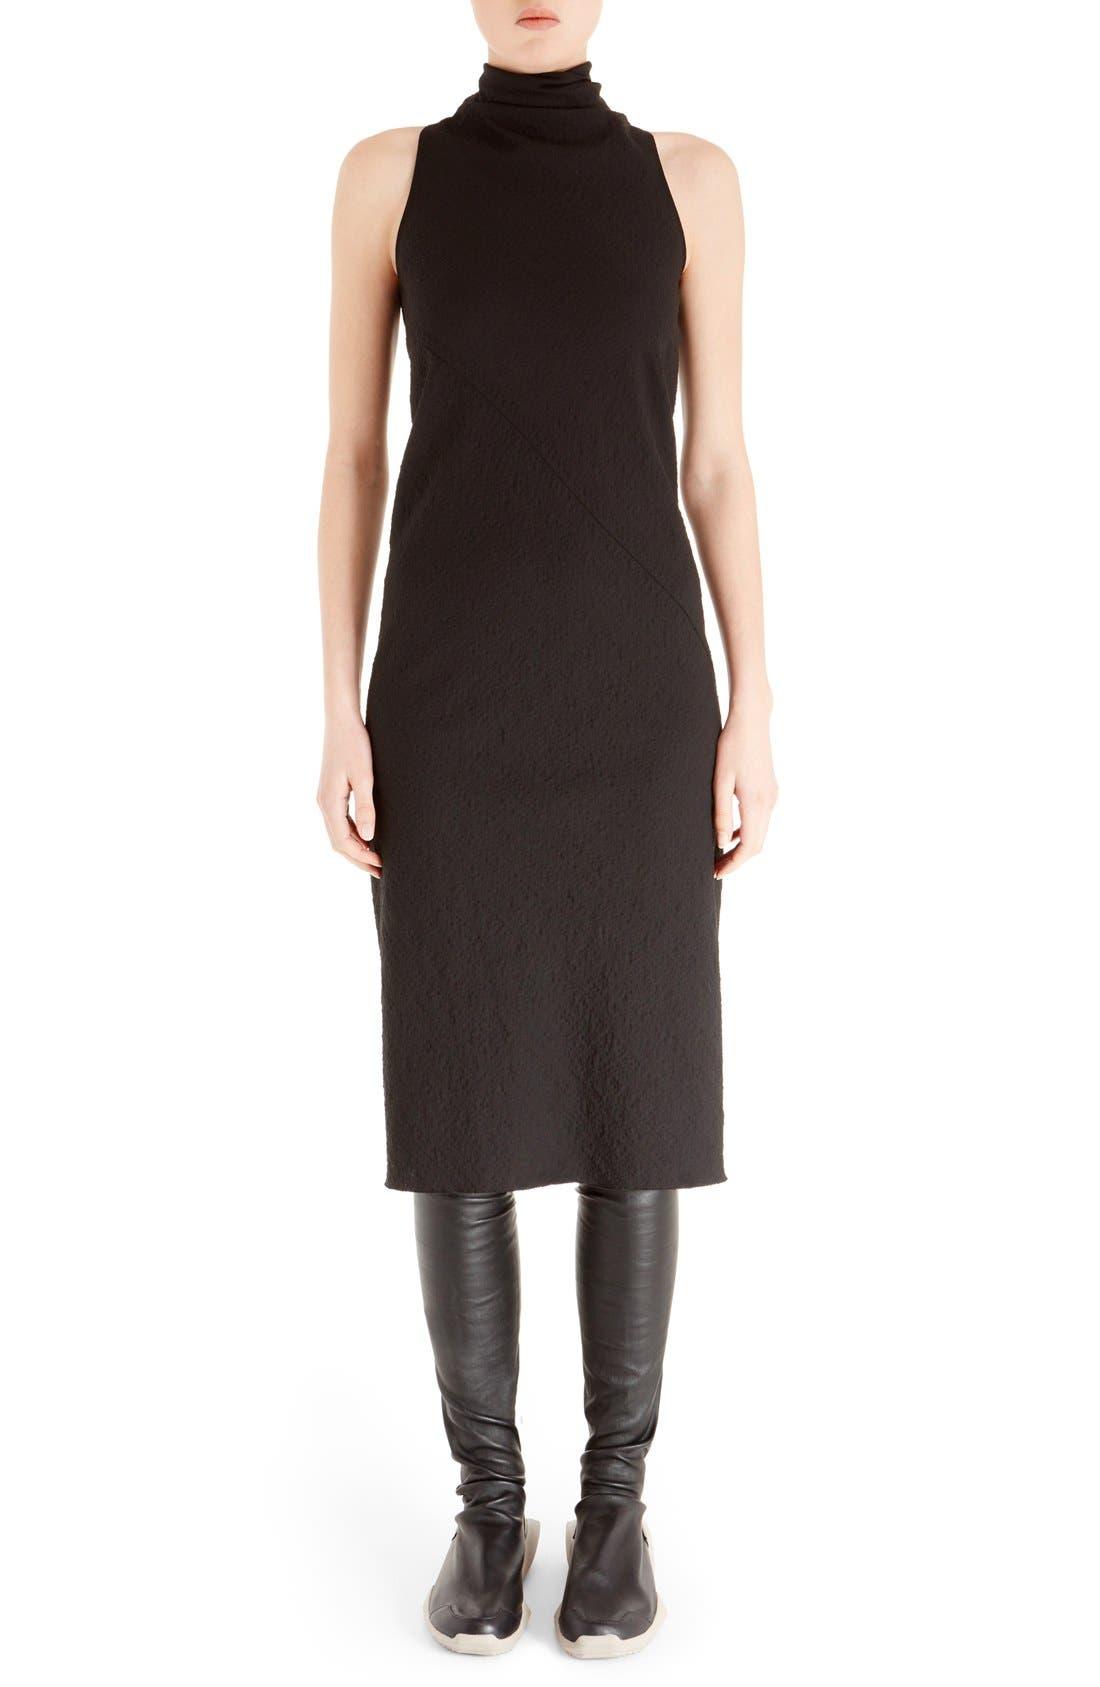 Alternate Image 1 Selected - Rick Owens Sleeveless Jacquard Sheath Dress